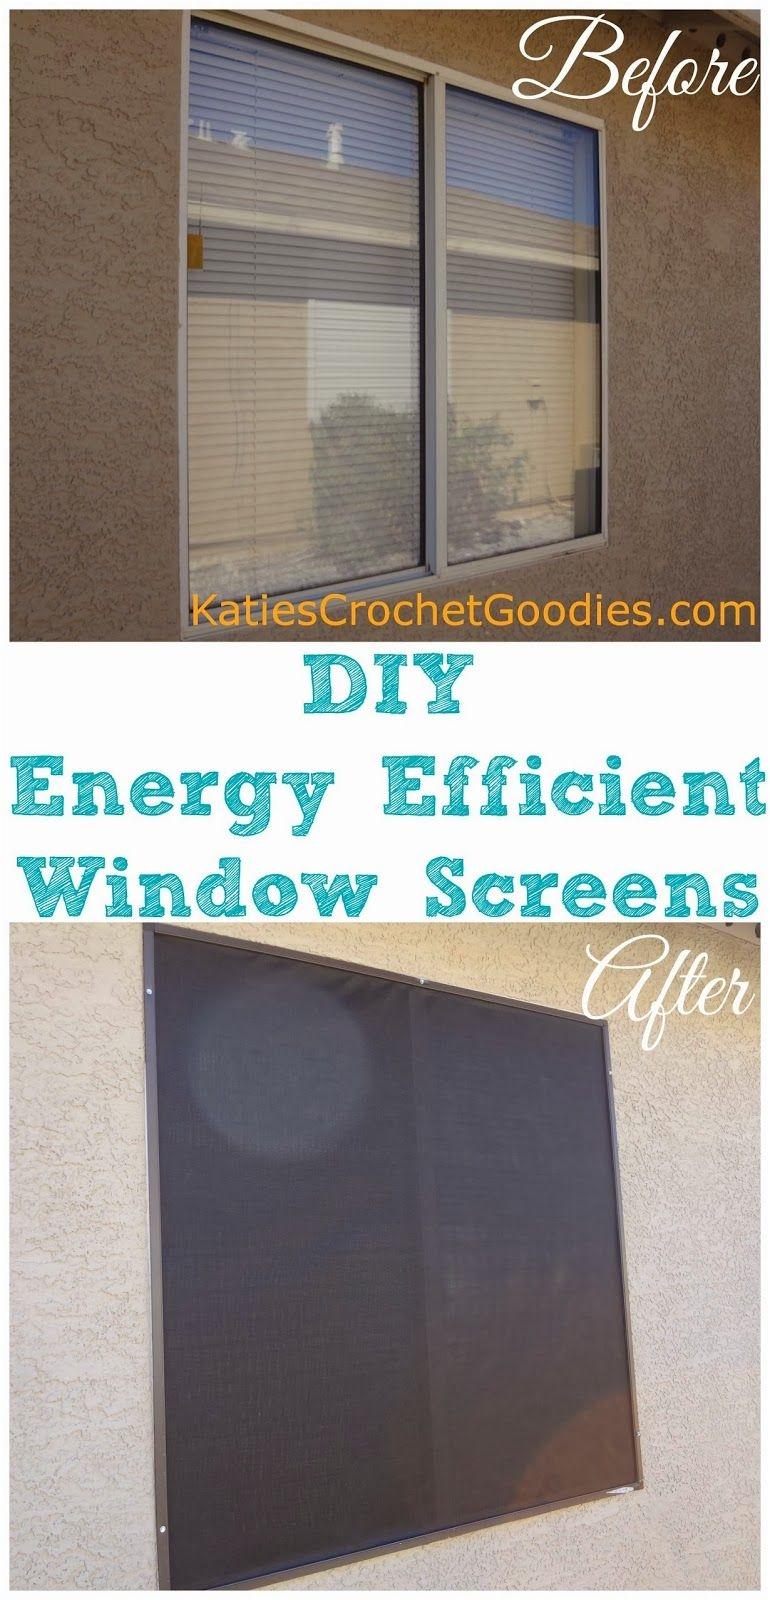 diy energy efficient window screens saveenergy environment energyefficient